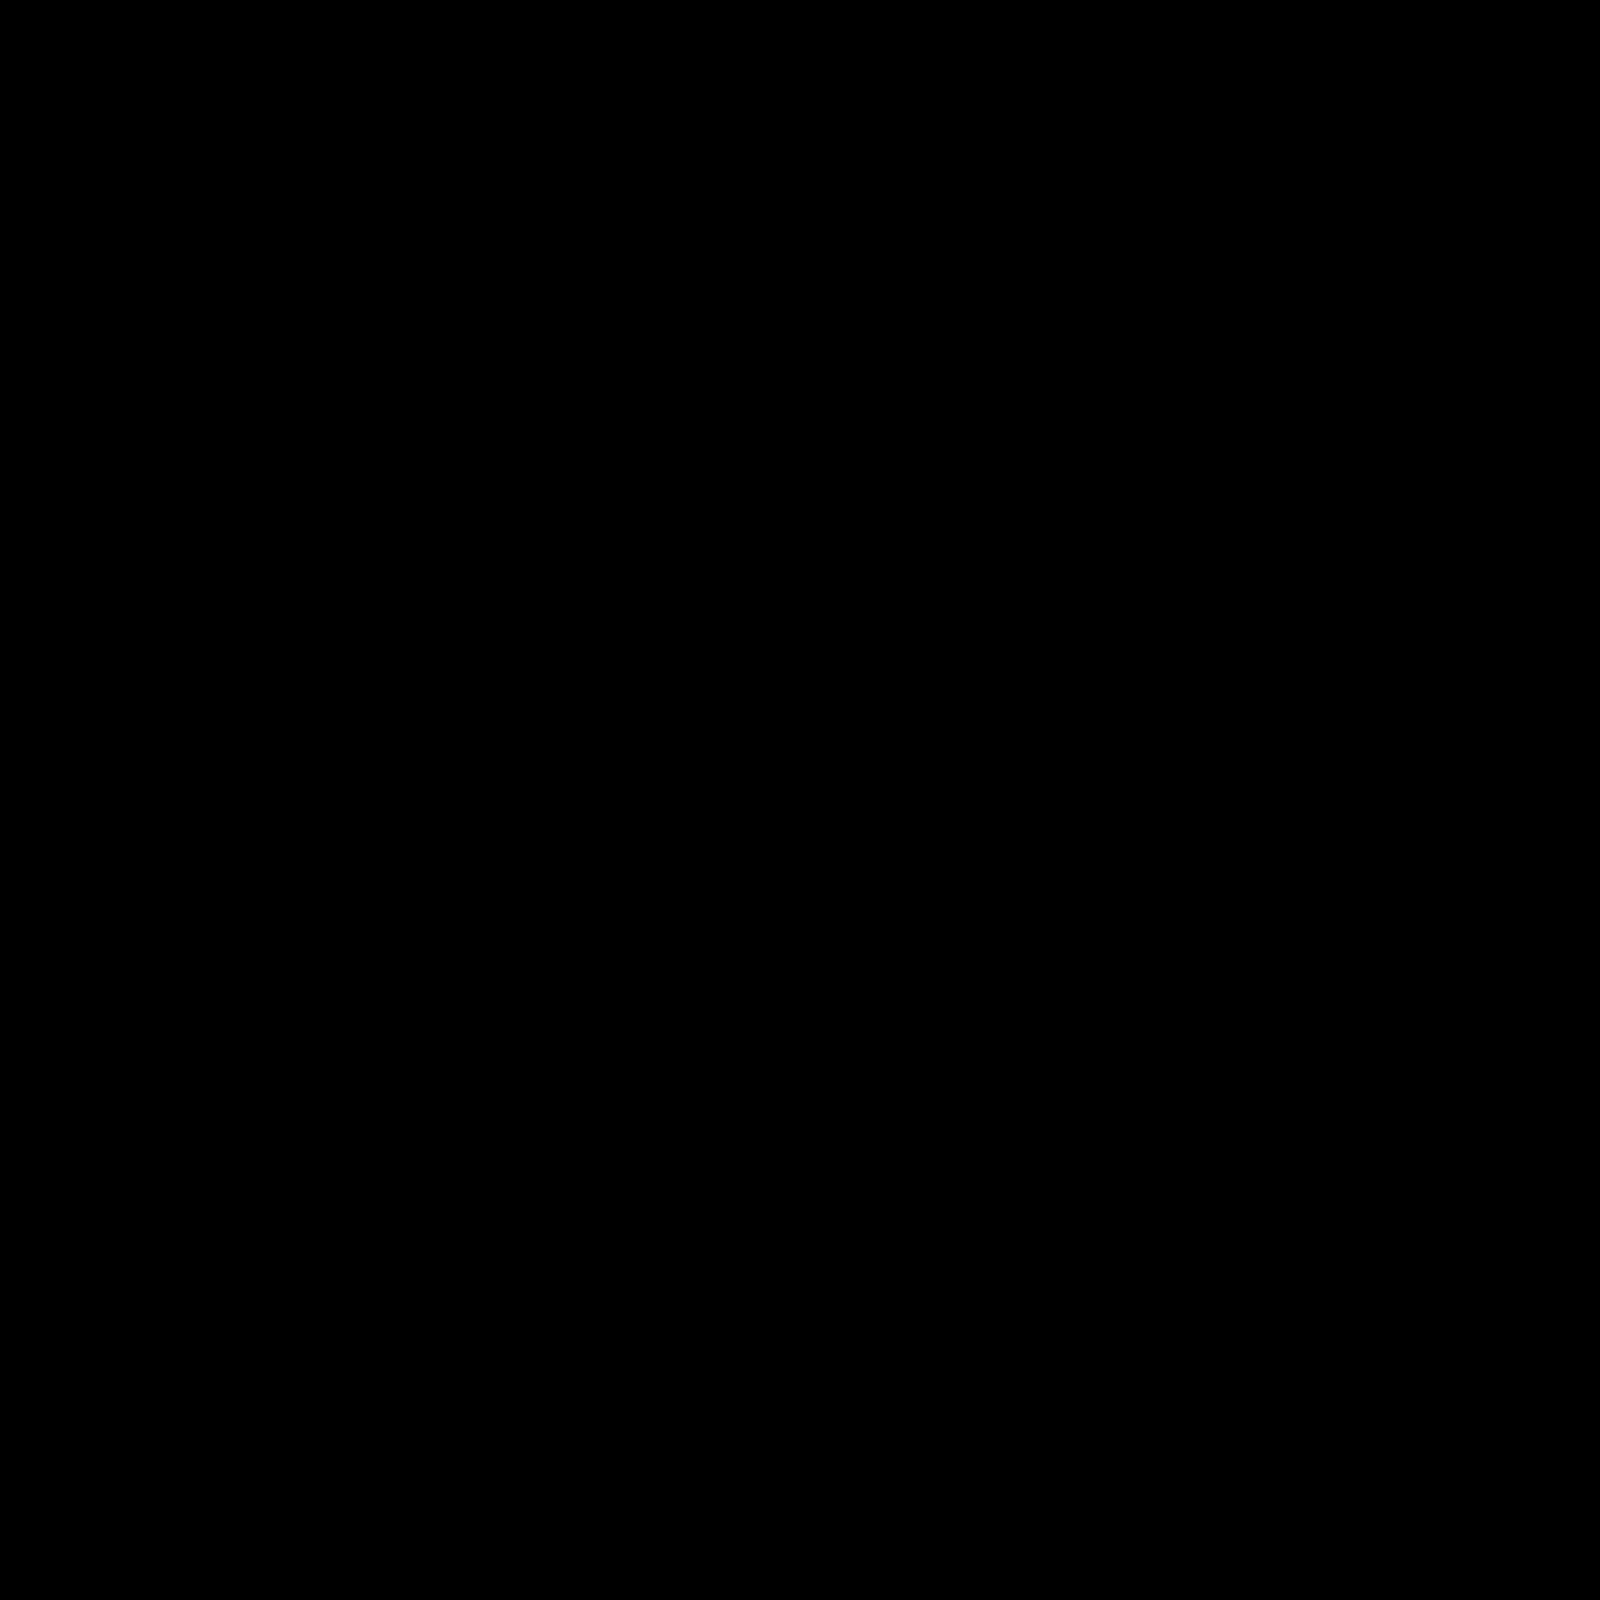 2008 icon